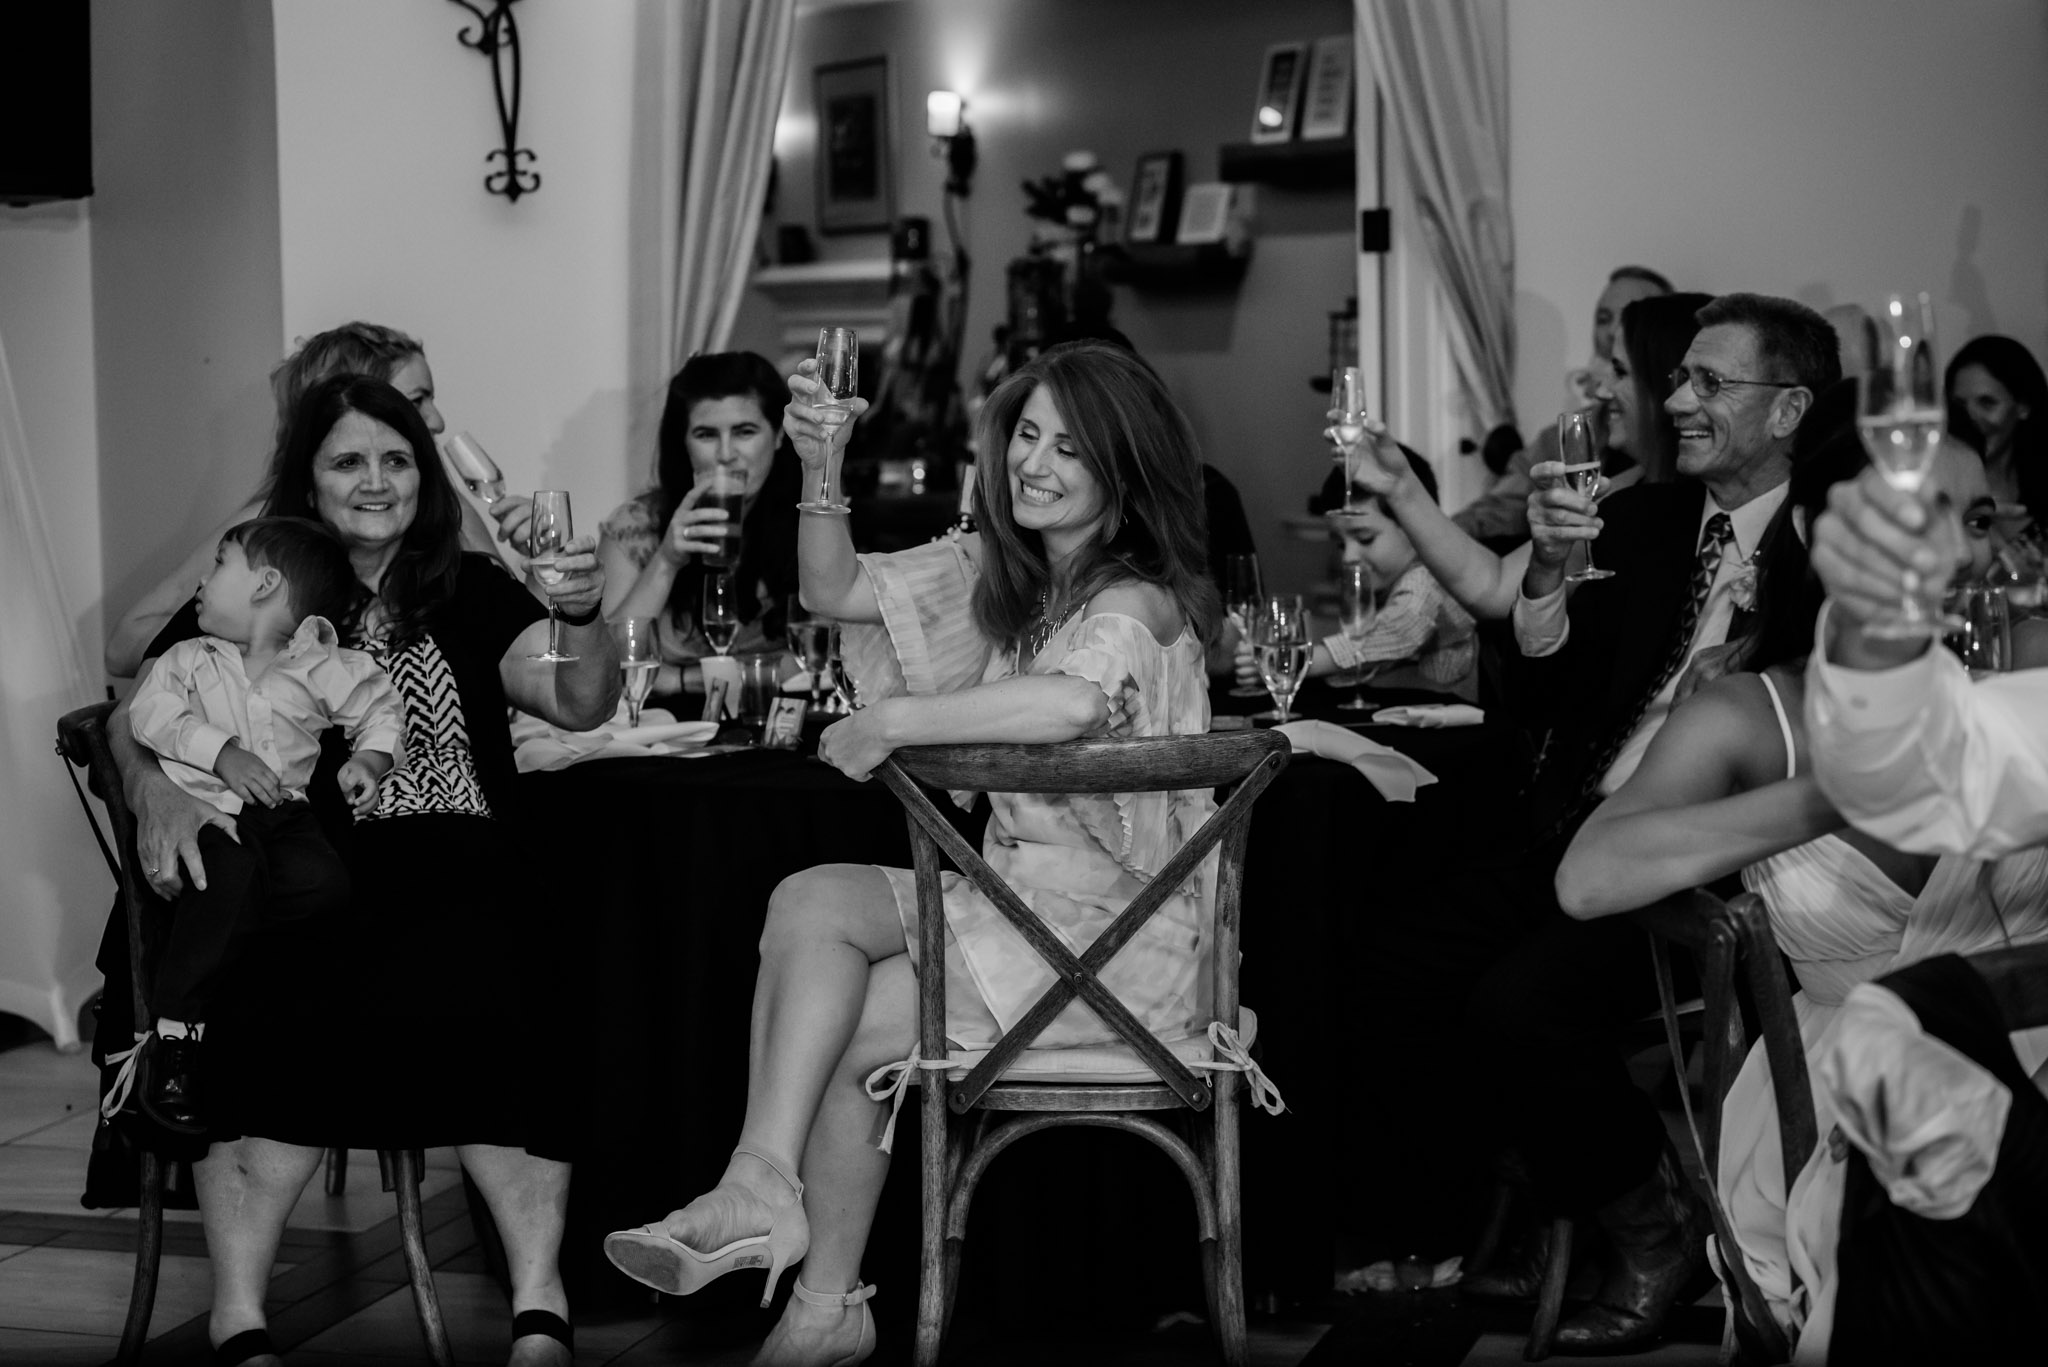 Avensole-Winery-Temecula-Wedding-Josh-and-Olivia-4056.JPG